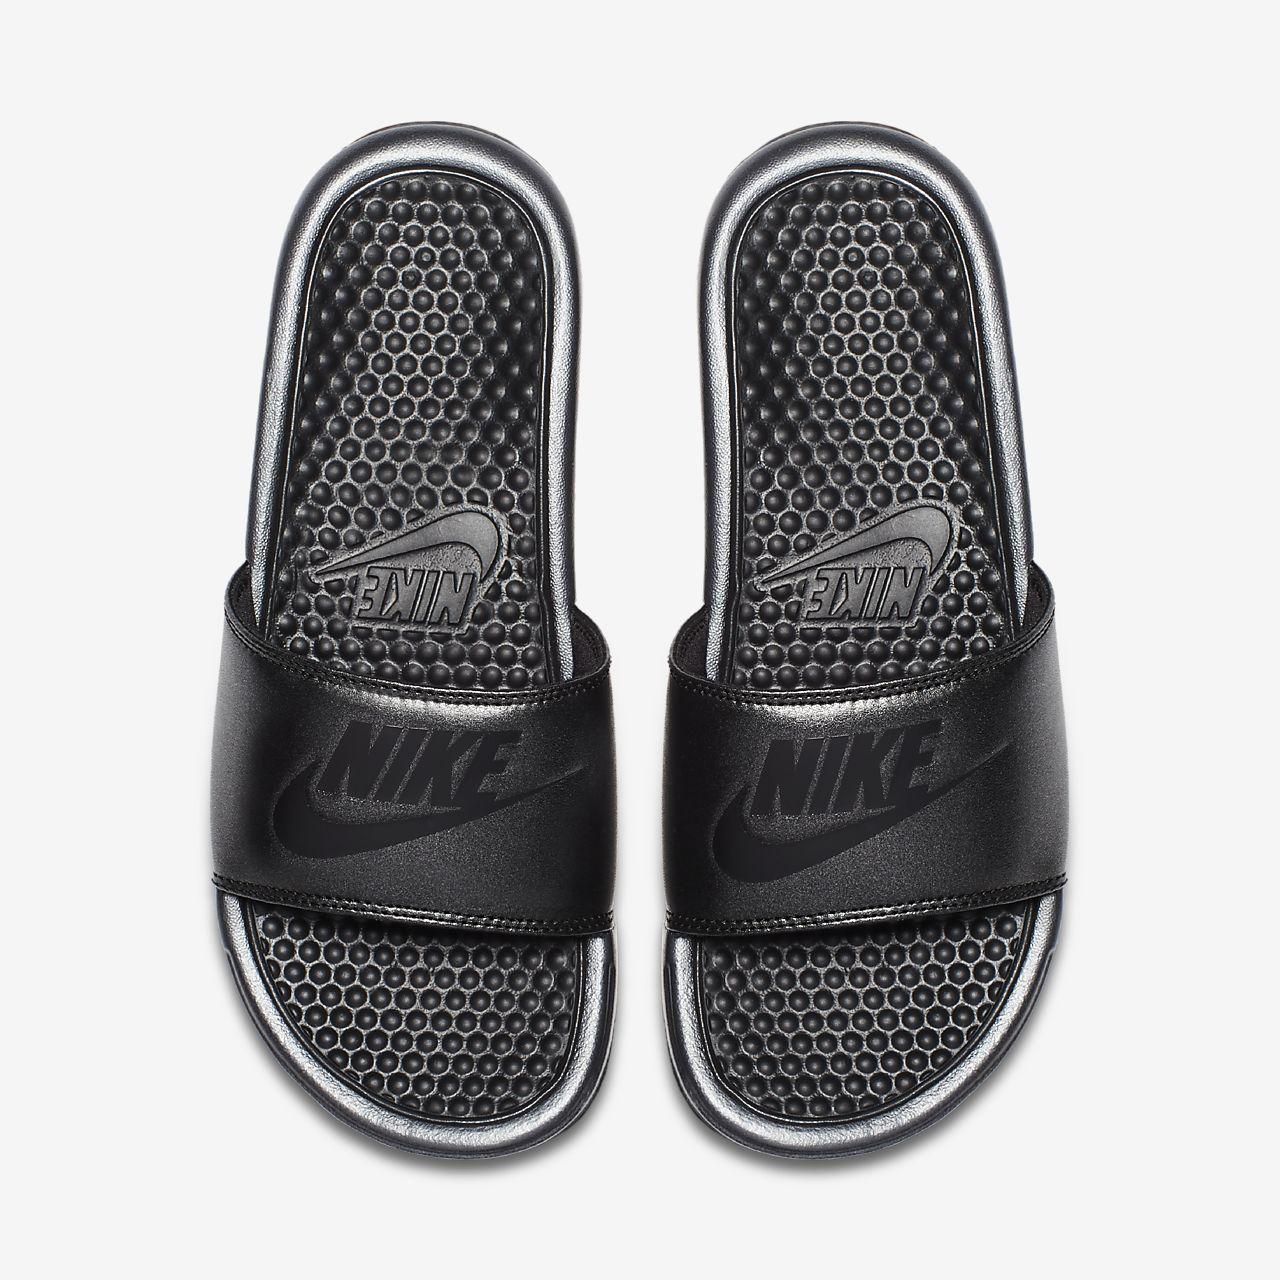 sale retailer 4fecf dc3c7 ... Nike Benassi Metallic QS Women s Slide